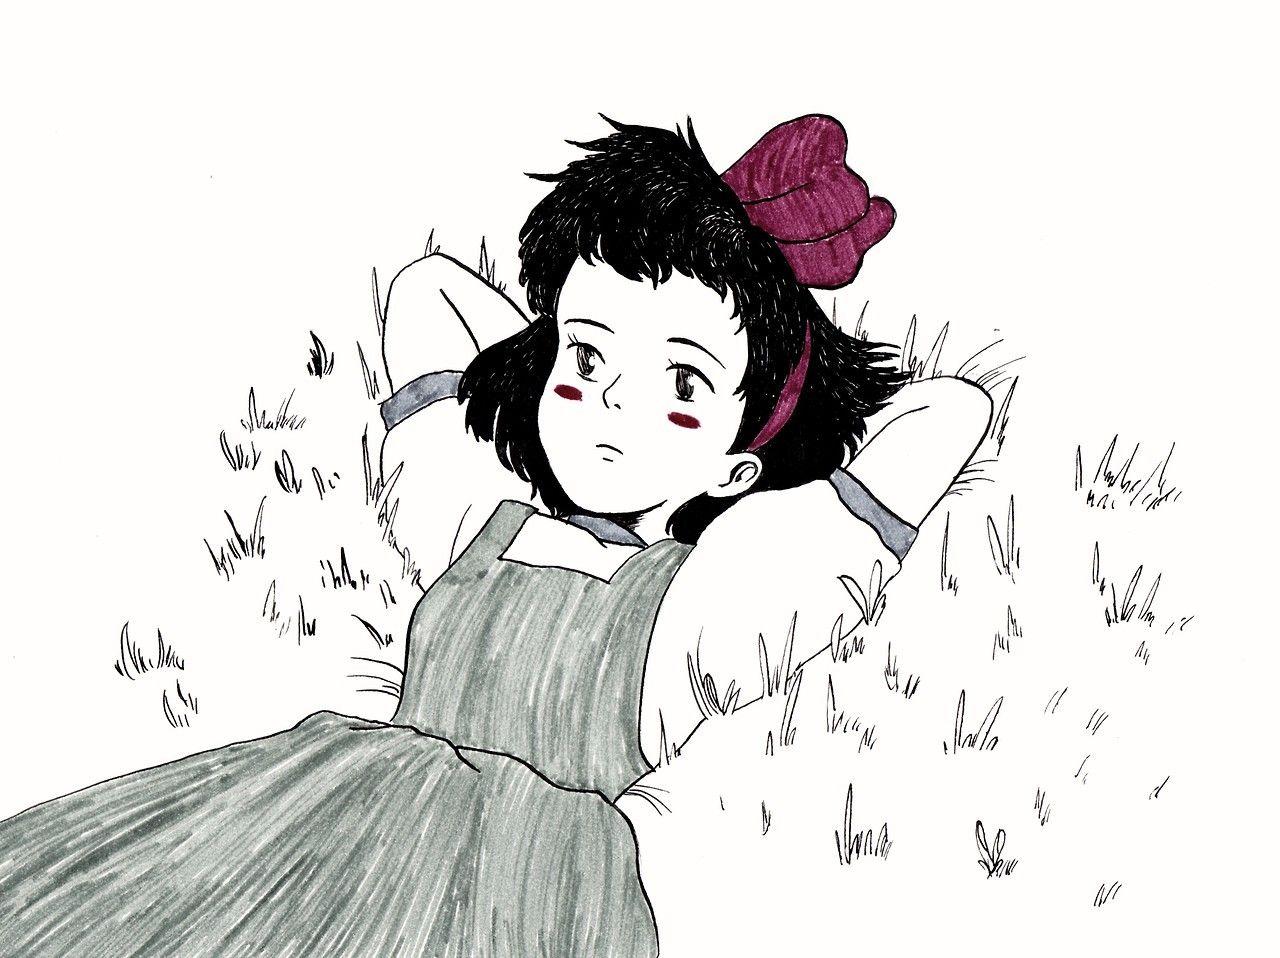 aesthetic drawings Tumblr Cute drawings, Drawings